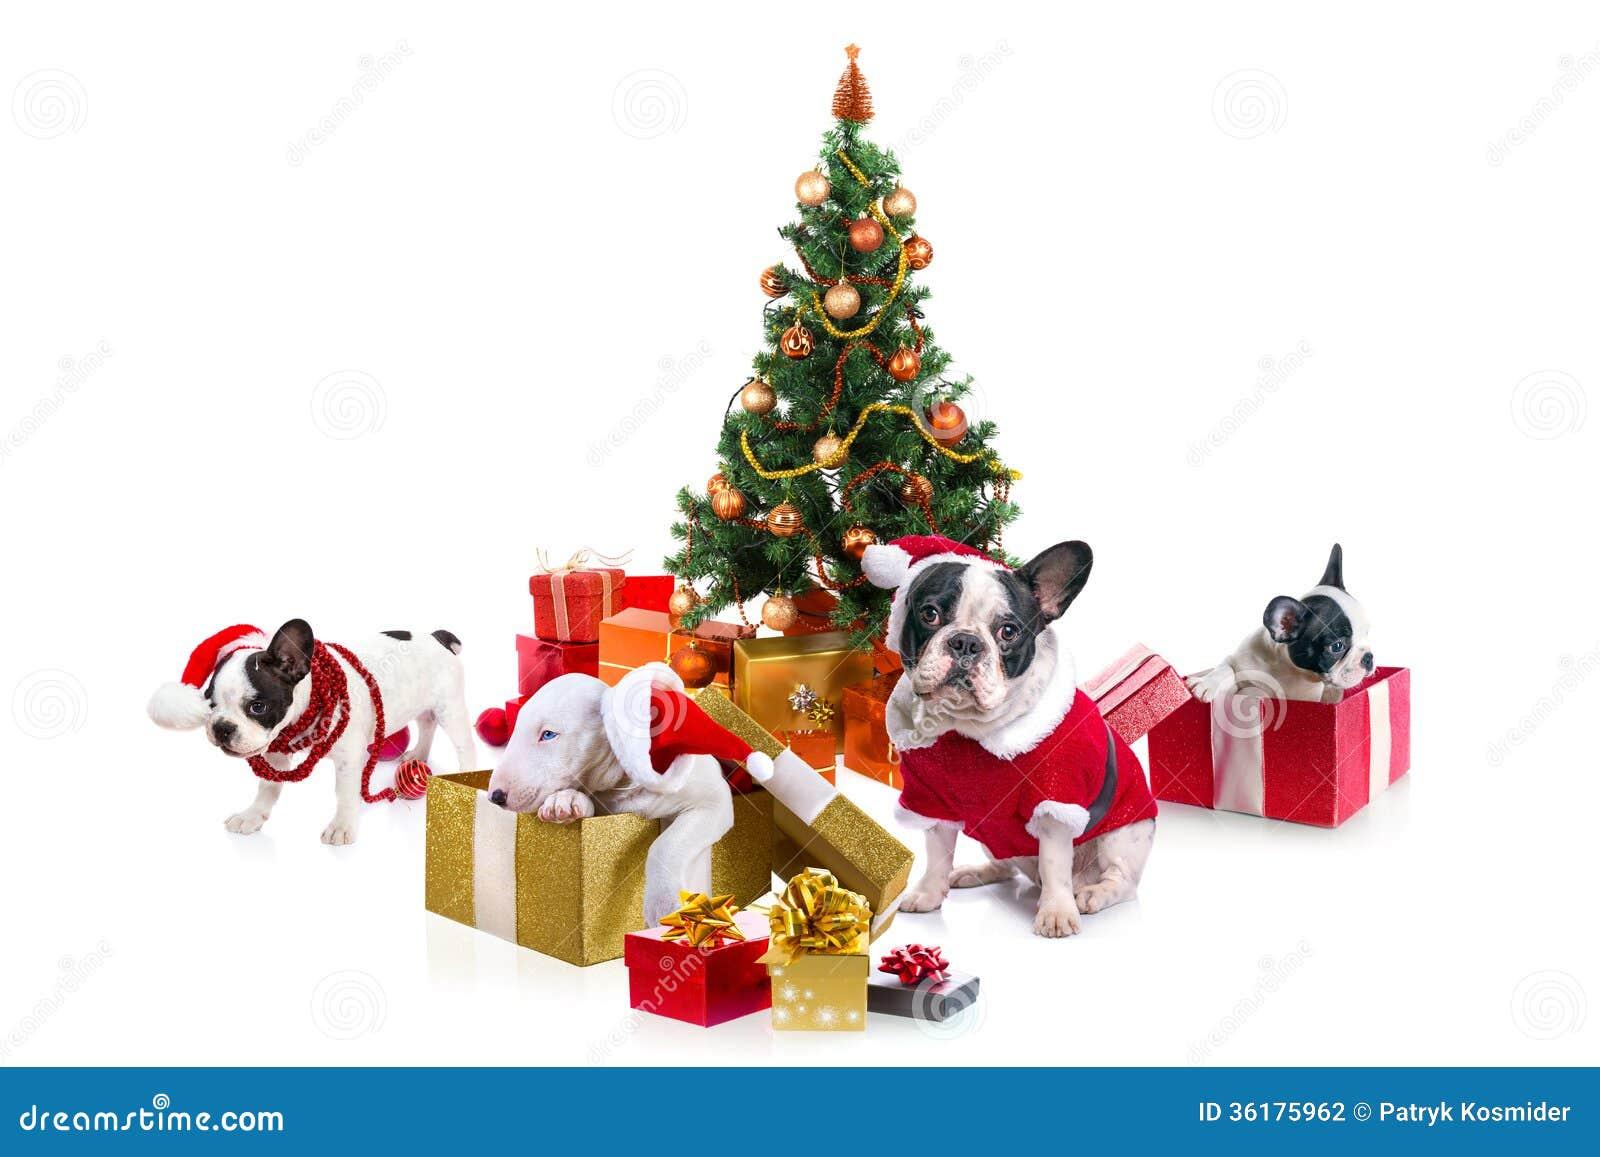 Fur Christmas Tree